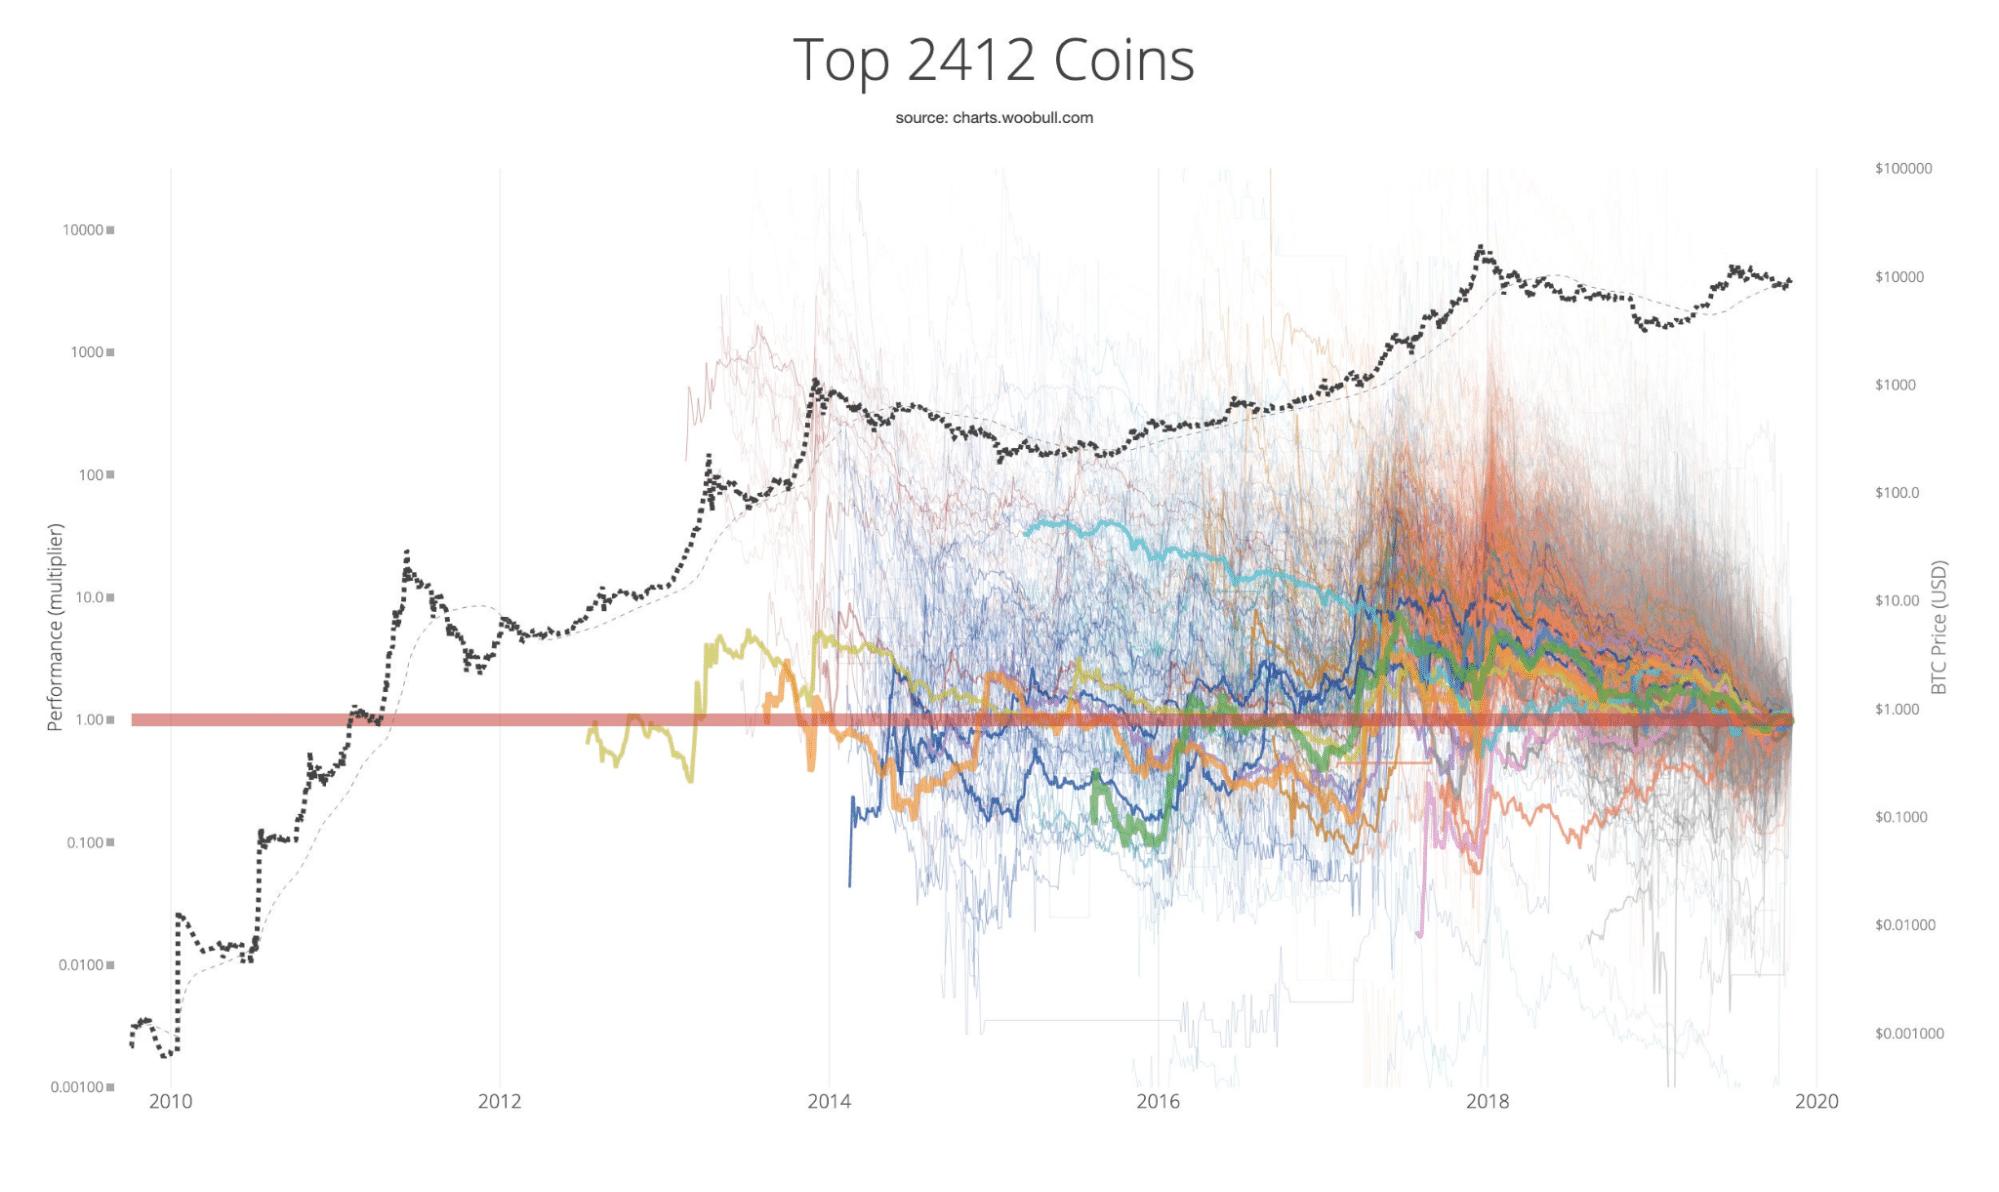 Top 2412 Coins